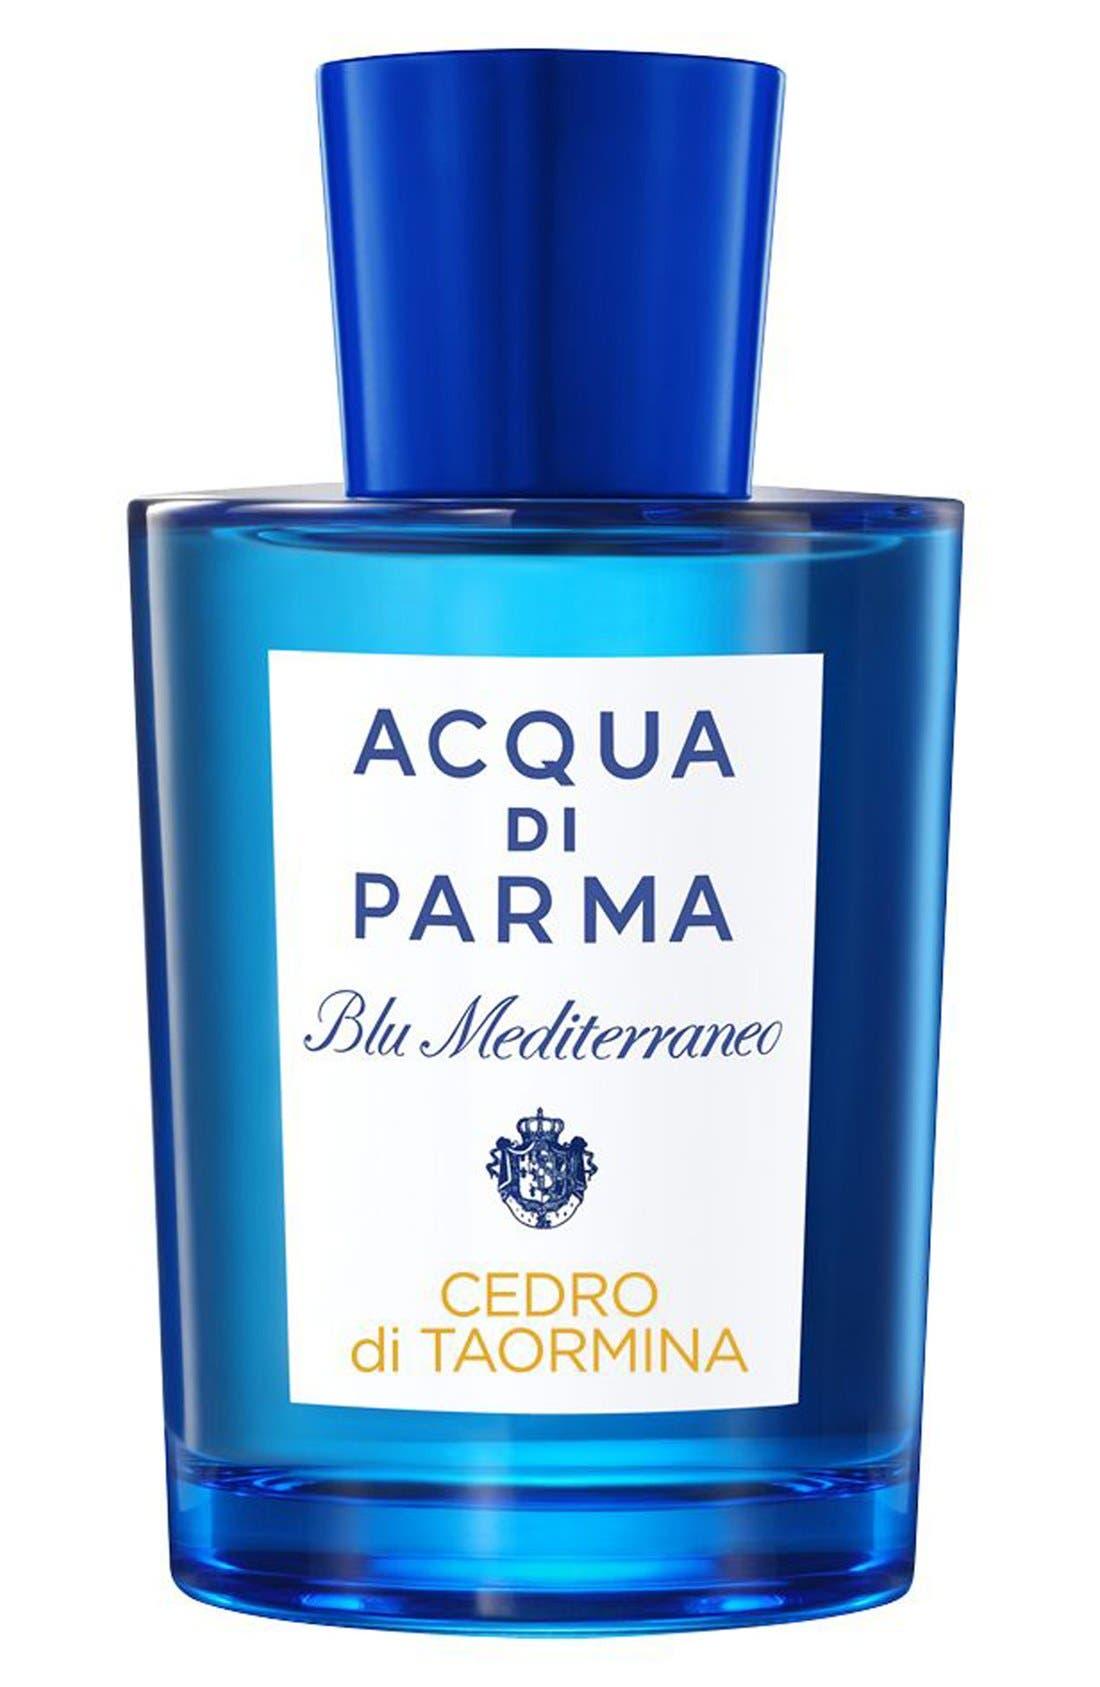 Blu Mediterraneo Cedro di Taormina Eau de Toilette,                             Alternate thumbnail 10, color,                             NO COLOR